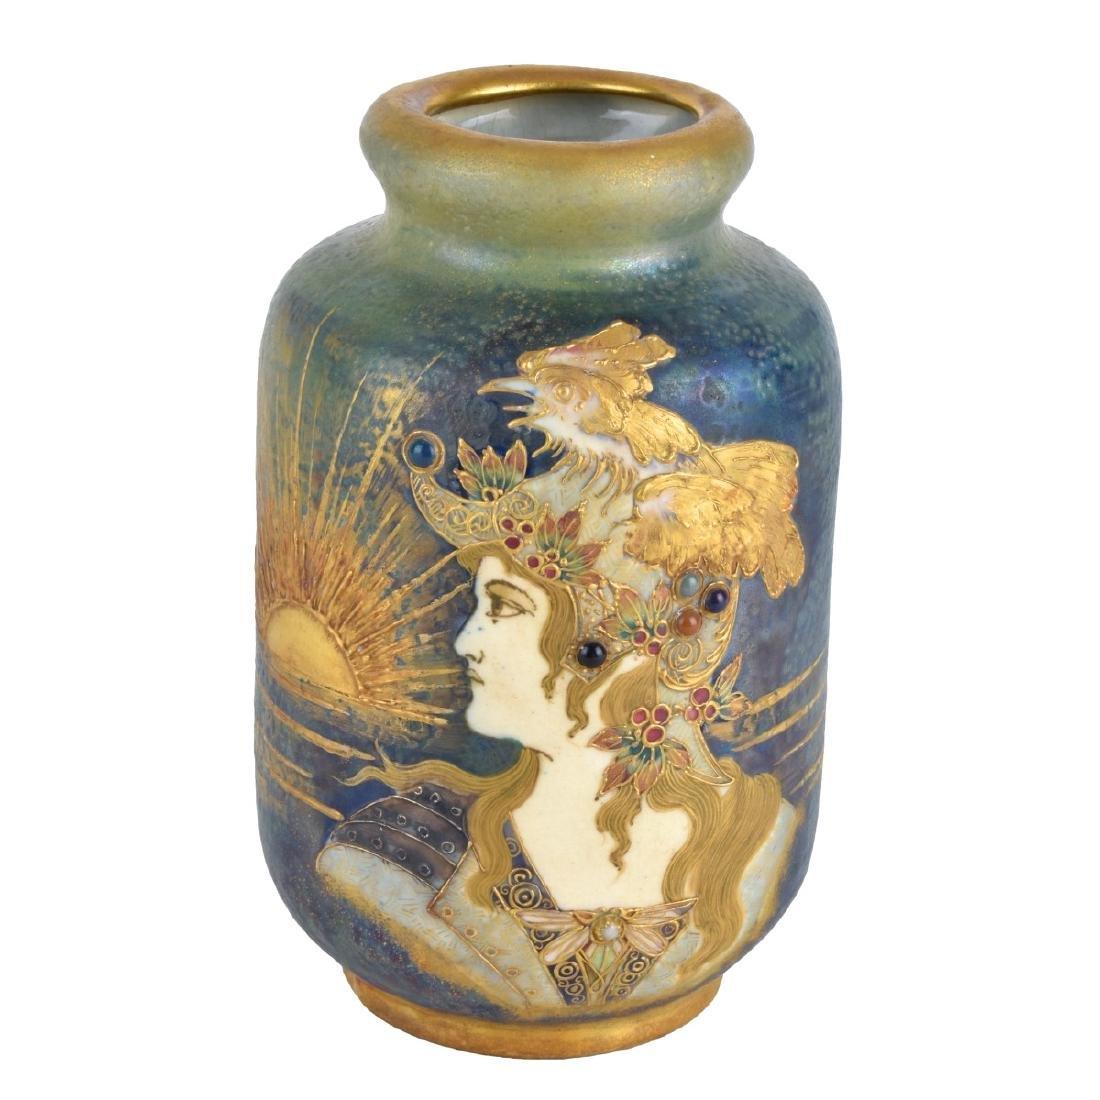 Turn Teplitz Amphora Gres Bijou Maiden Vase